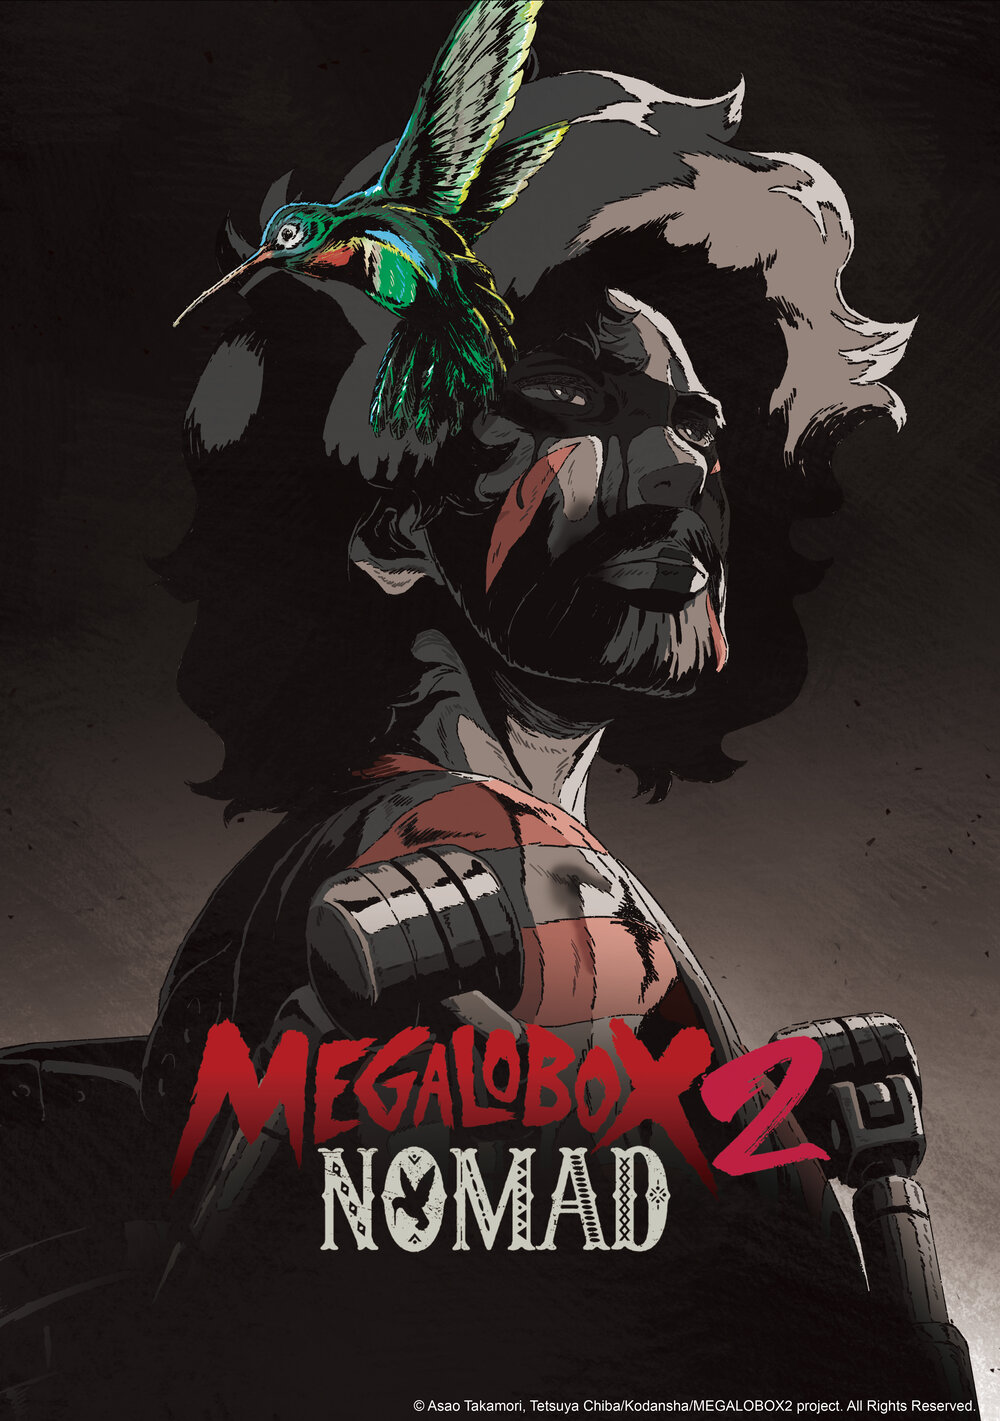 263979342c7fa918a20c4af88fe375f81615254028_main - Megalo Box (T2): Nomad [06/13 + 01/13] (Sub/Dob) (Ligero) (Emisión) - Anime Ligero [Descargas]